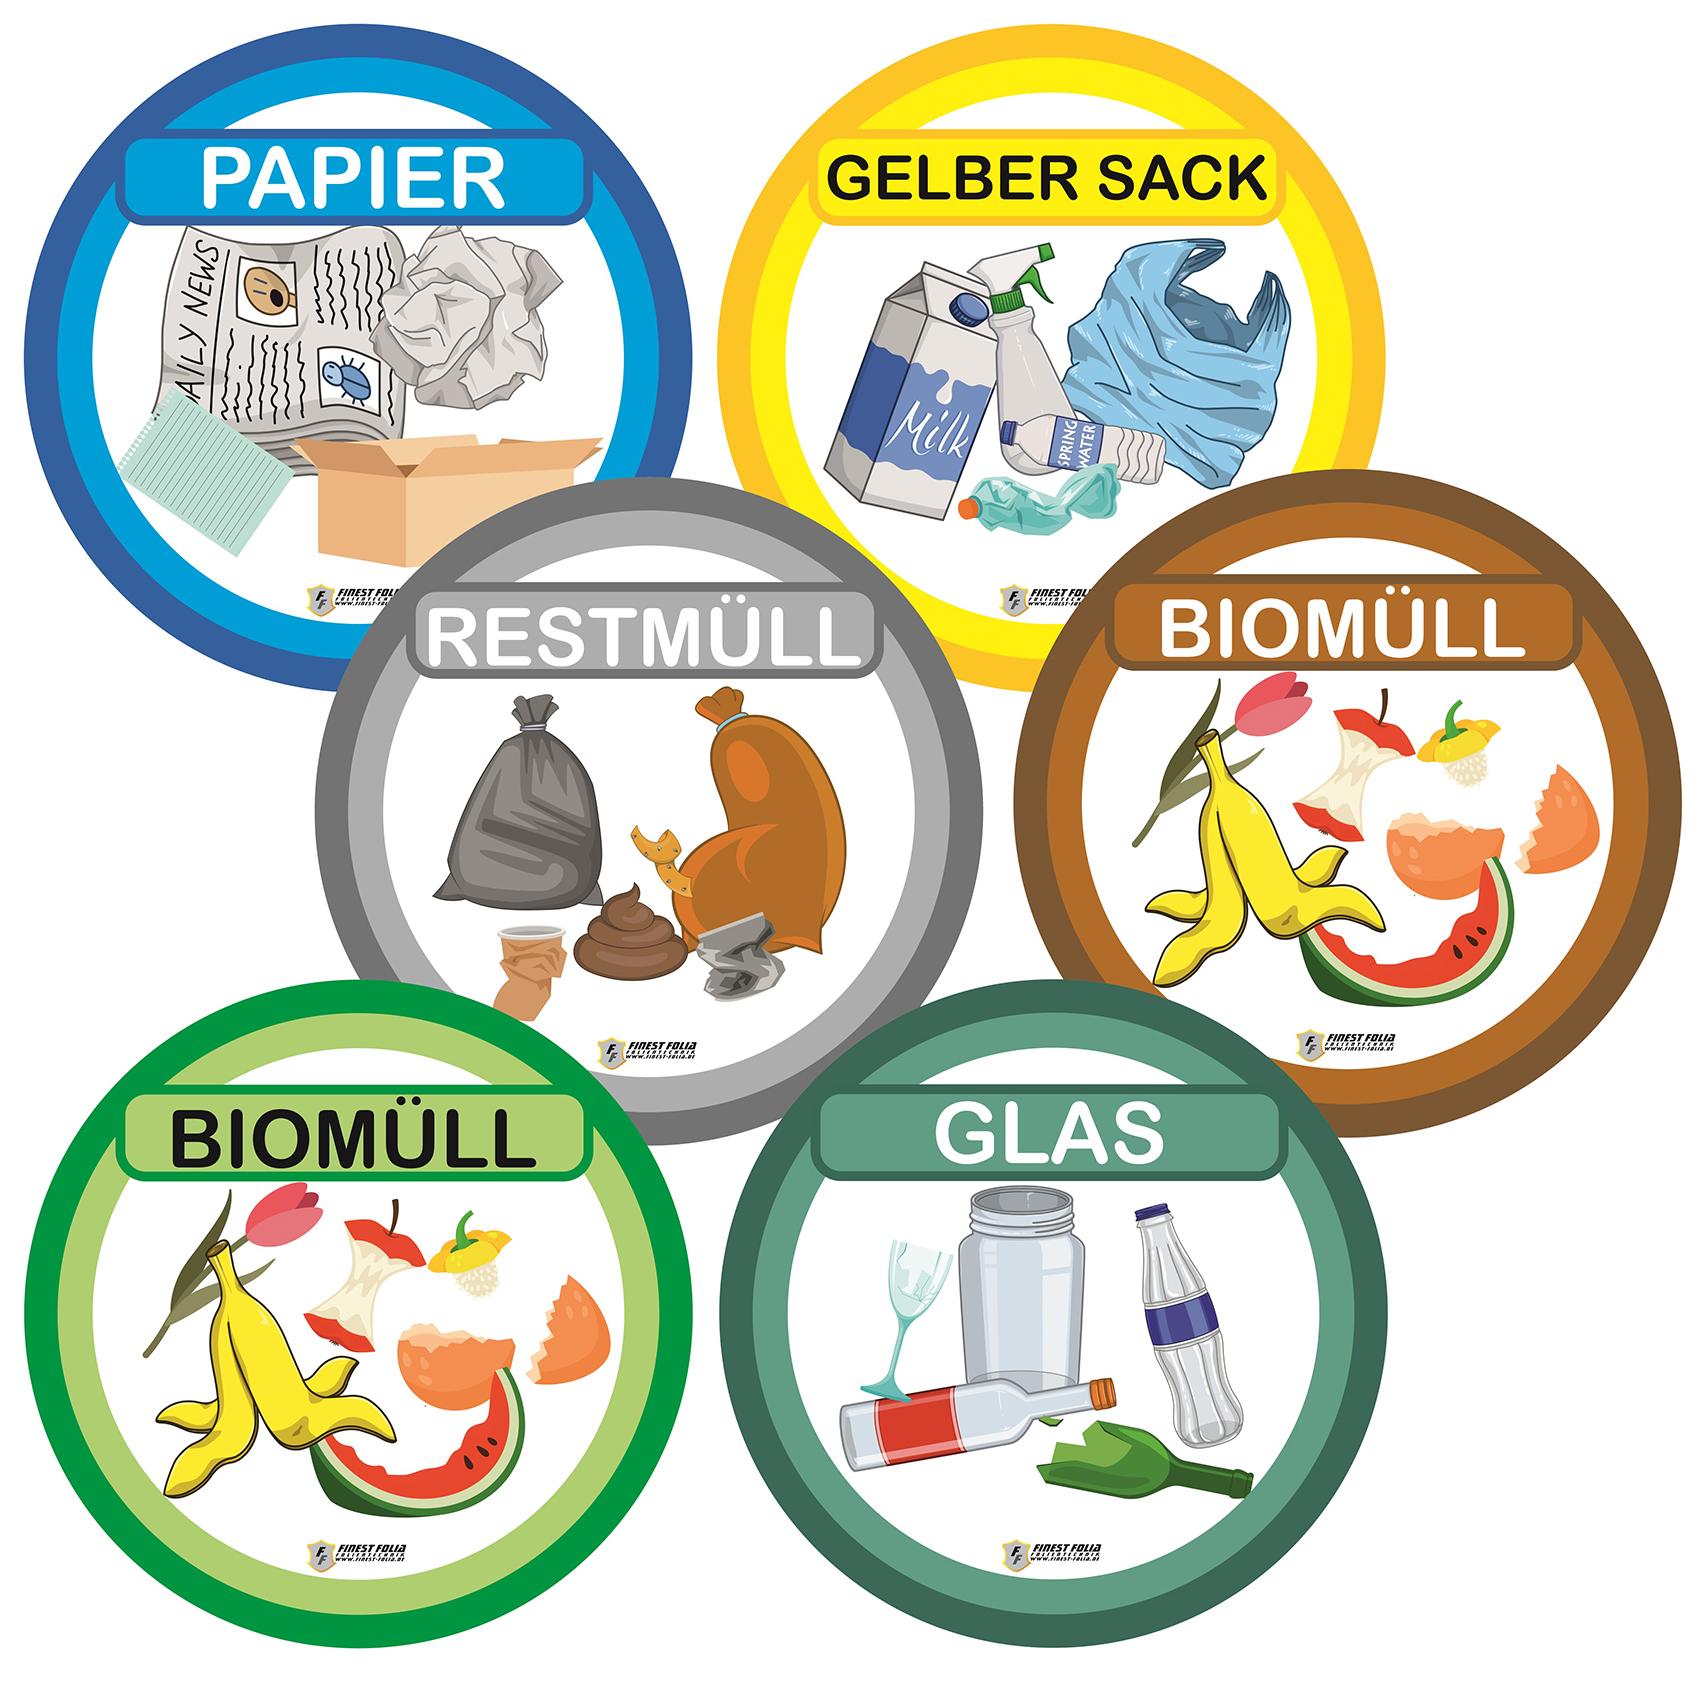 Details Zu 6er Set Runde Aufkleber Bunt Für Mülltrennung Mülltonne Abfalltonne Mülleimer V2